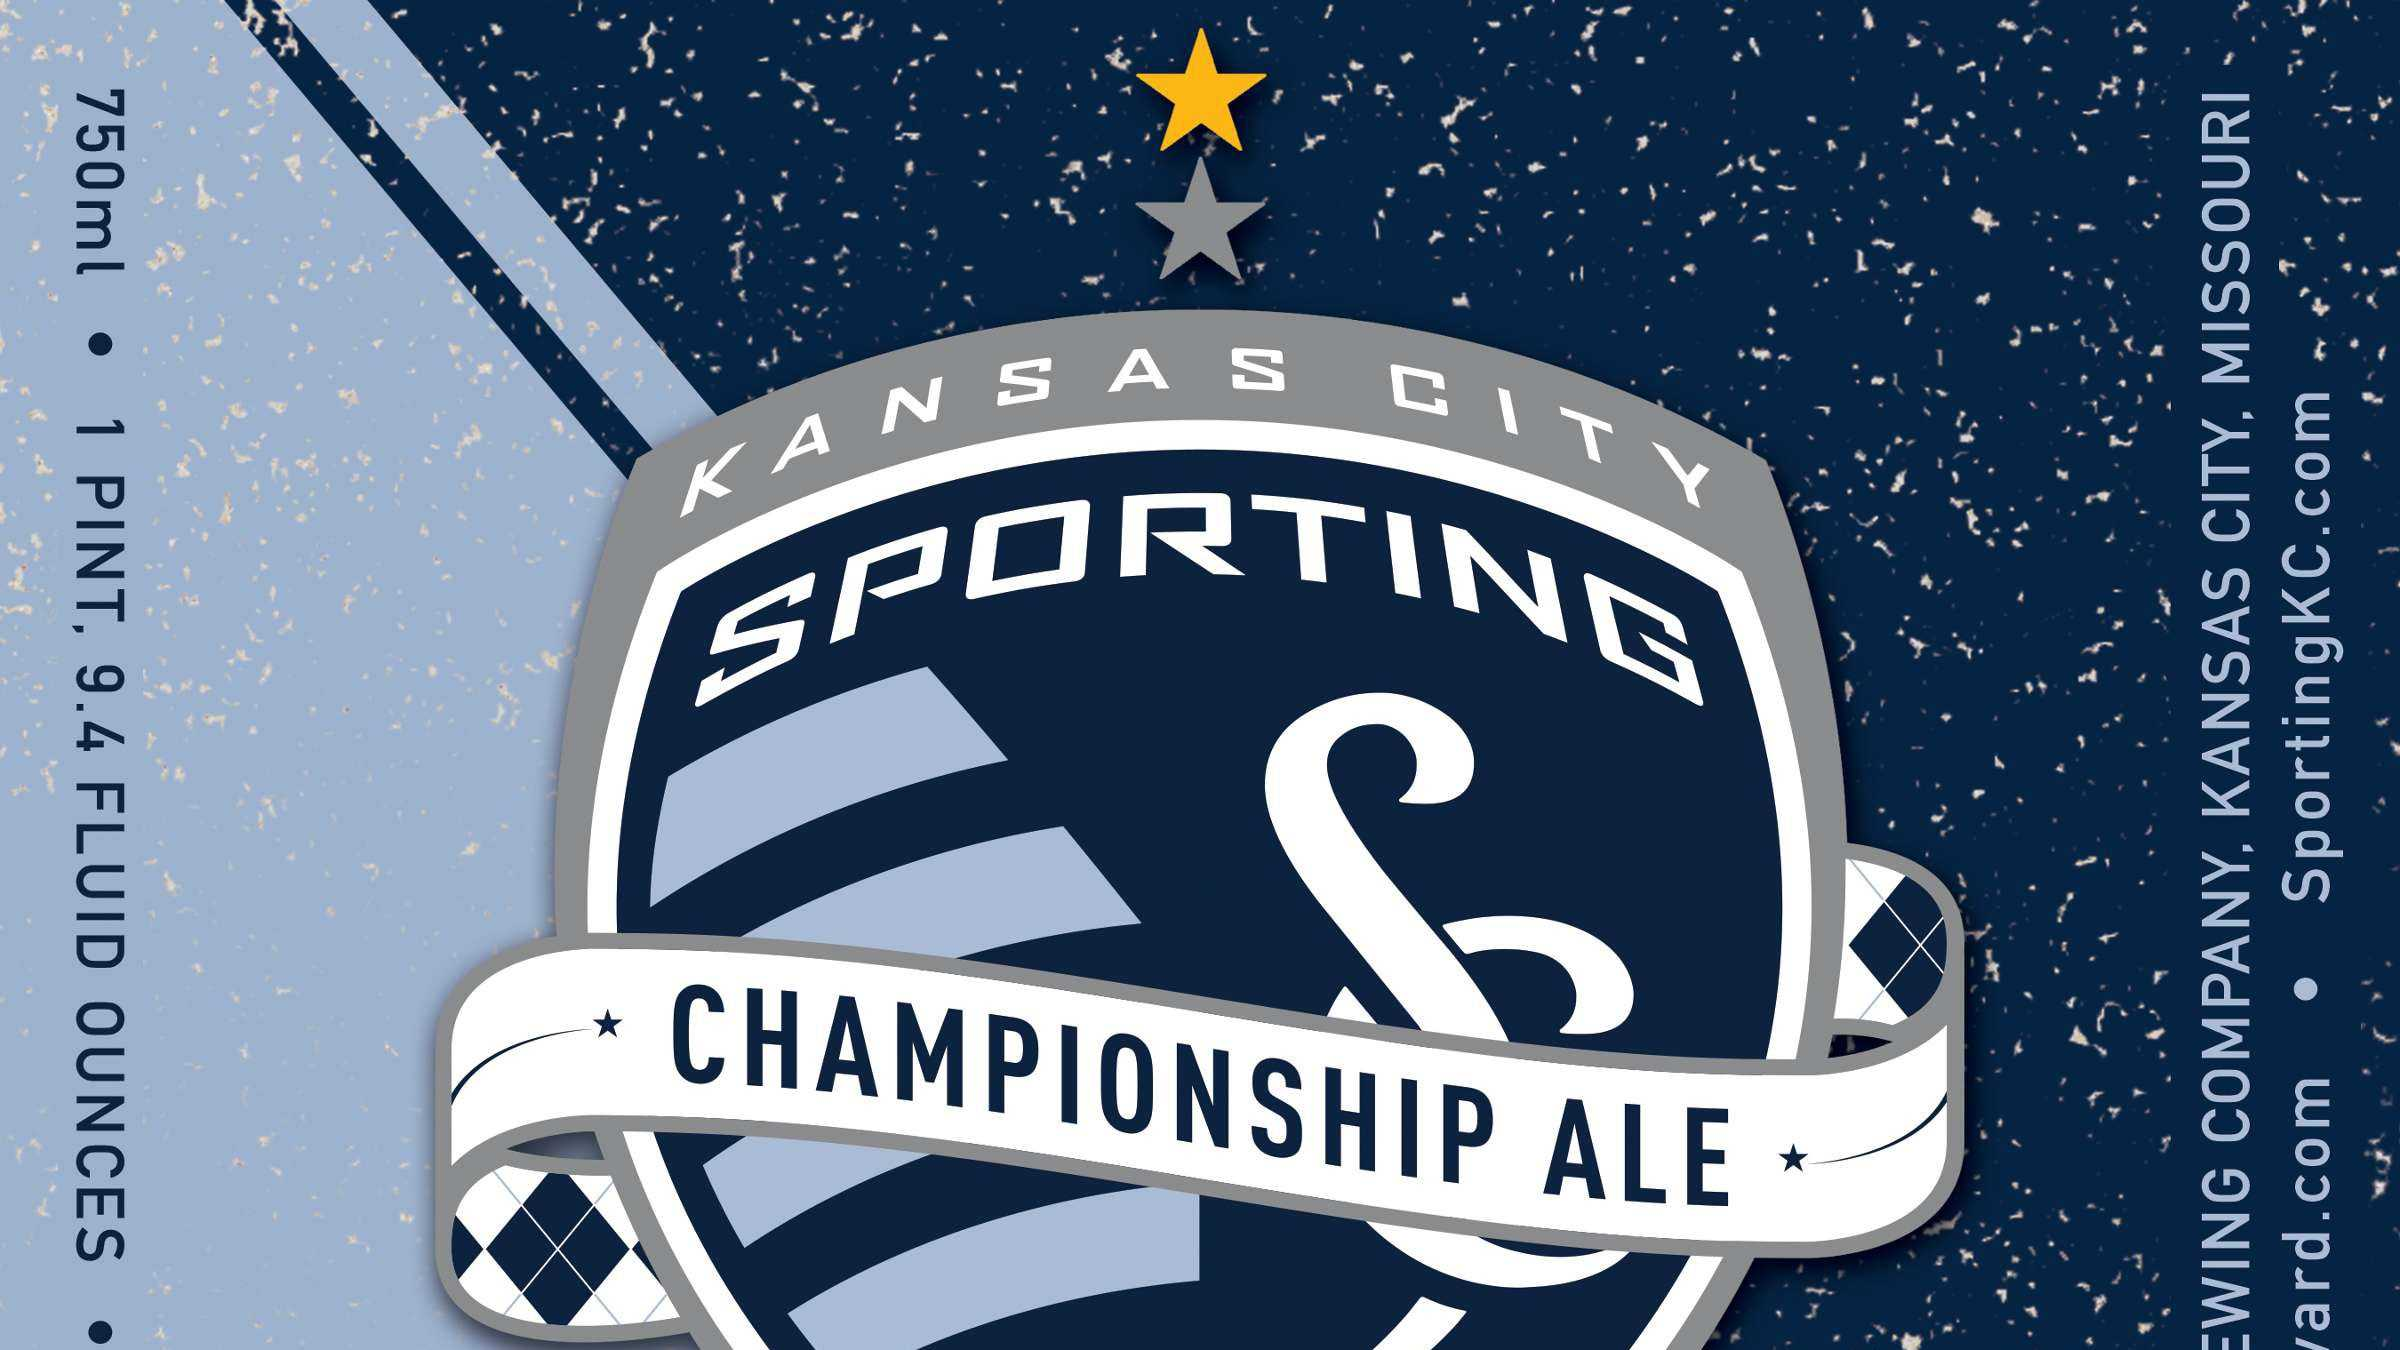 Championship Ale, Sporting